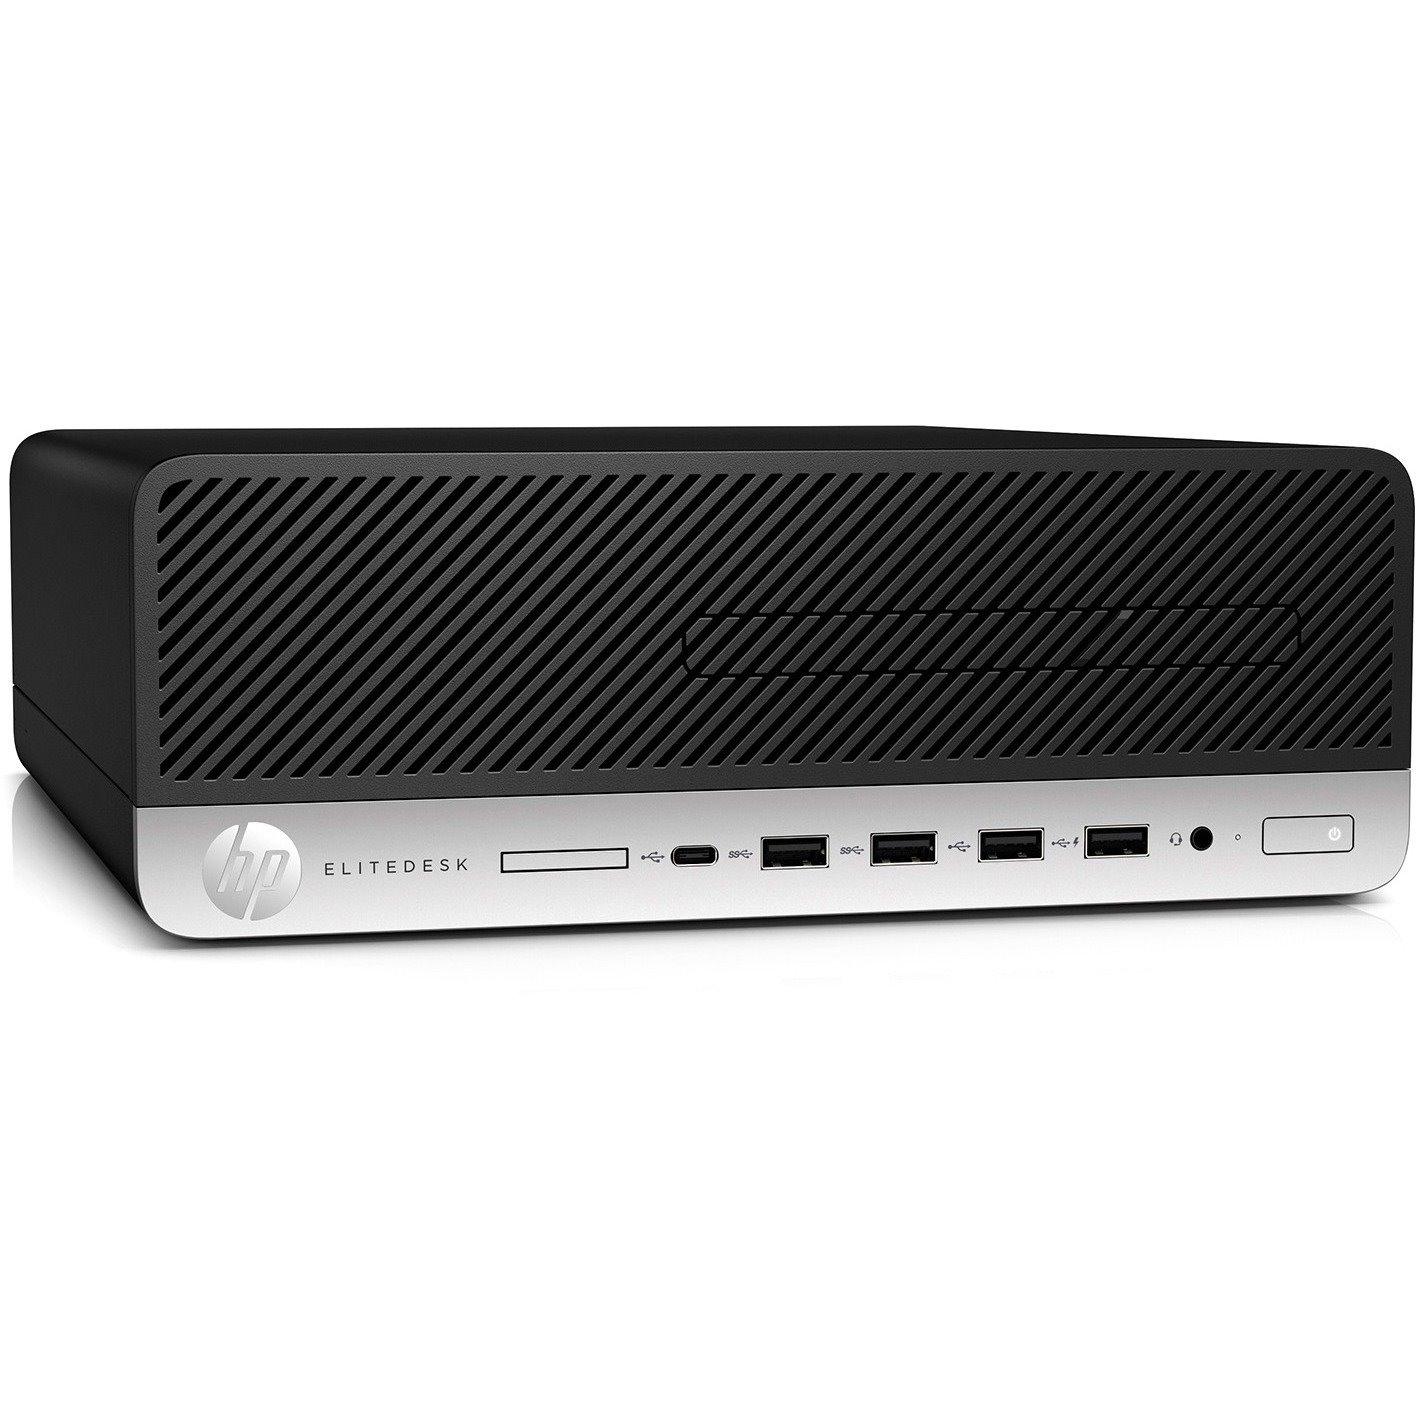 HP EliteDesk 705 G4 Desktop Computer - Ryzen 7 PRO 2700 - 8 GB RAM - 256 GB SSD - Small Form Factor